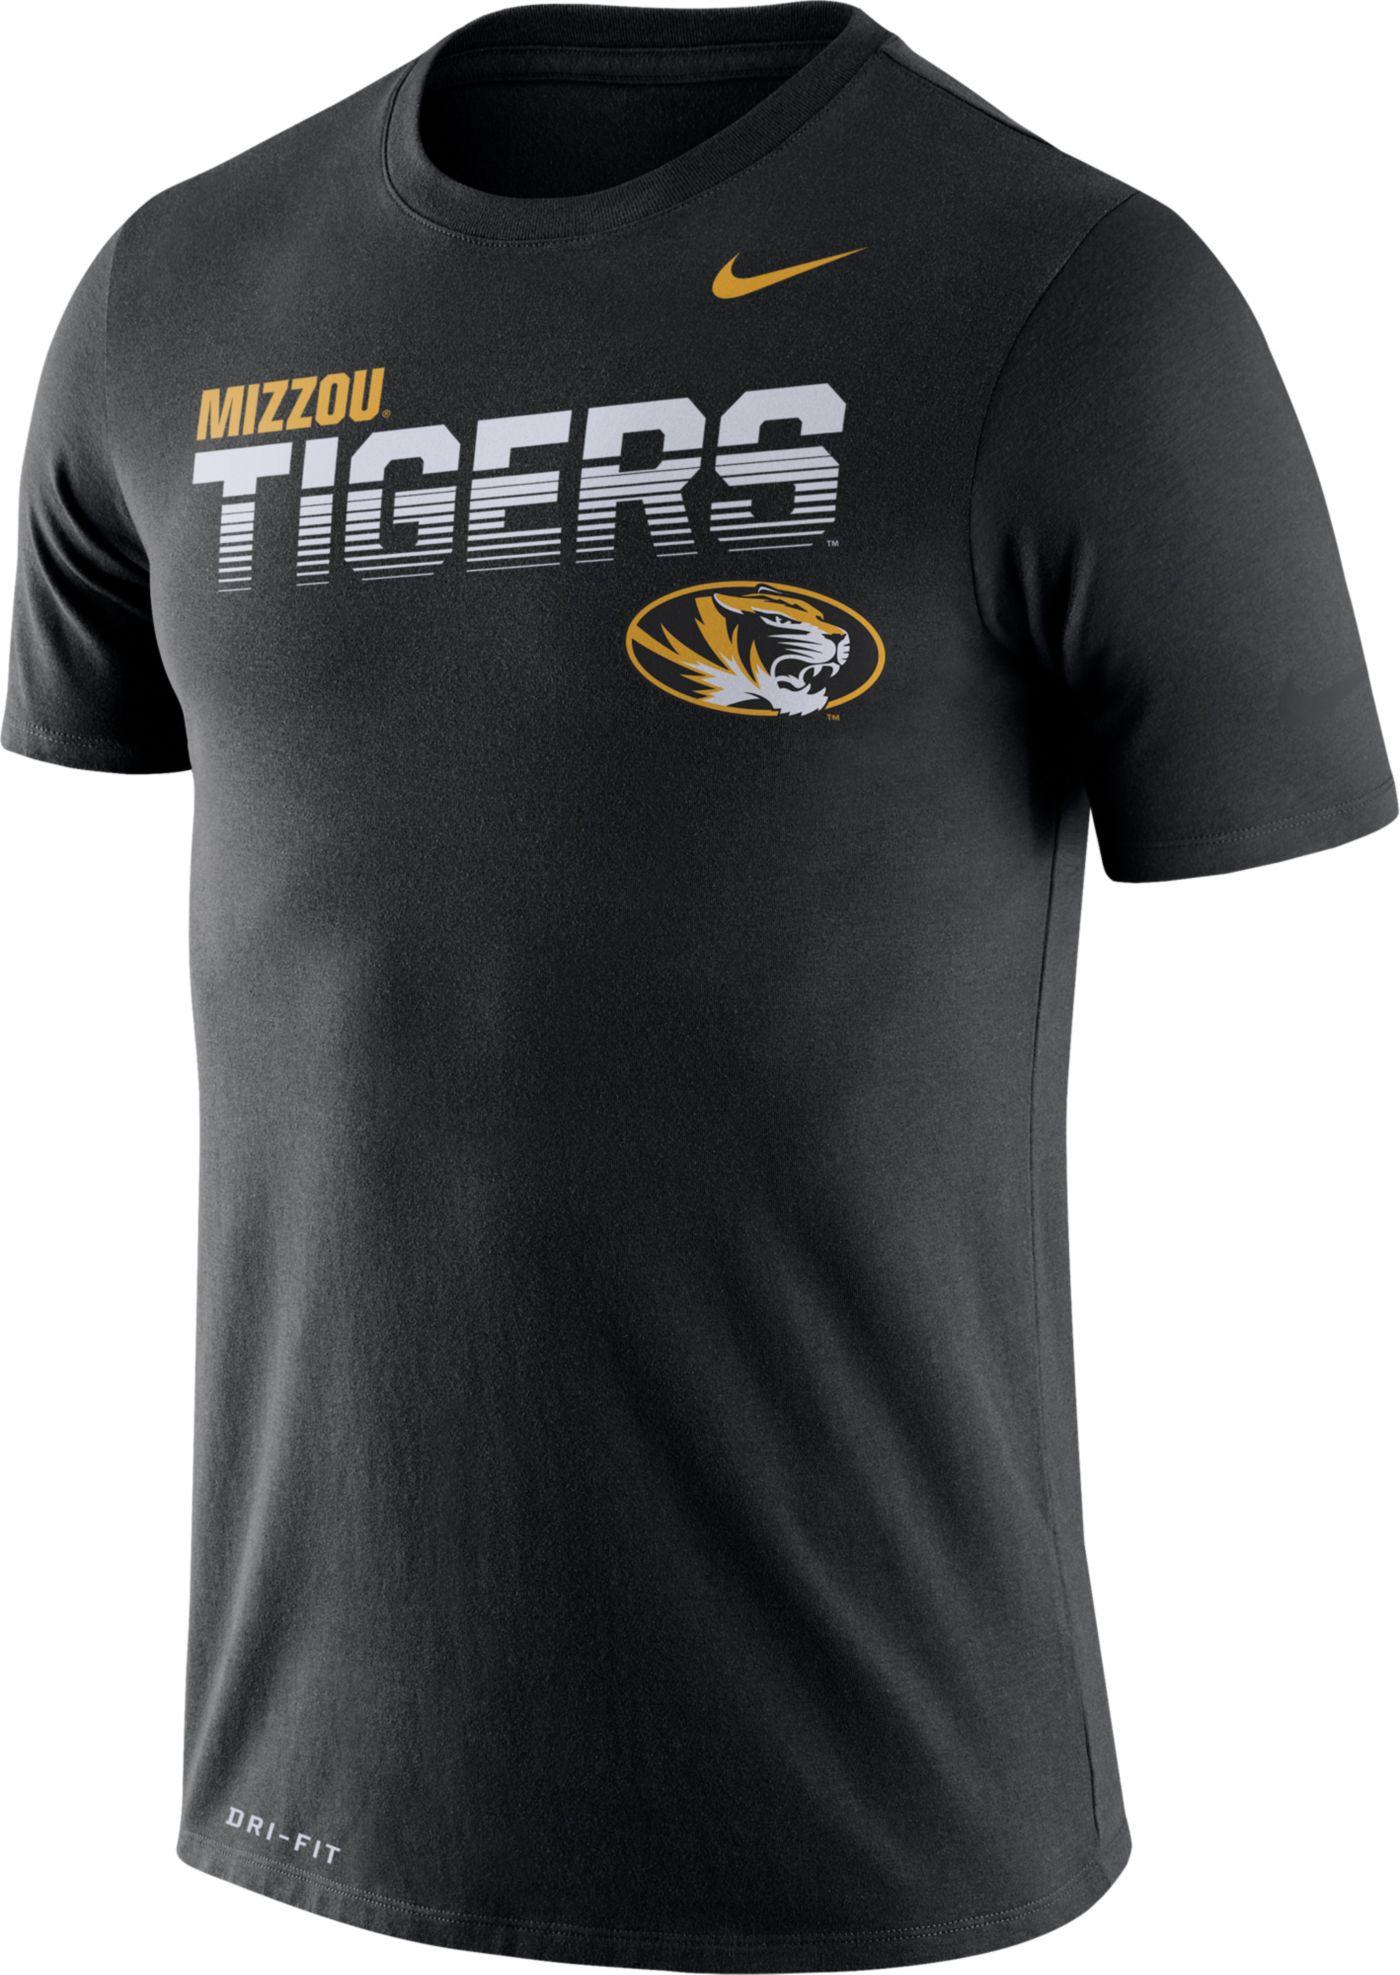 Nike Men's Missouri Tigers Legend Football Sideline Black T-Shirt